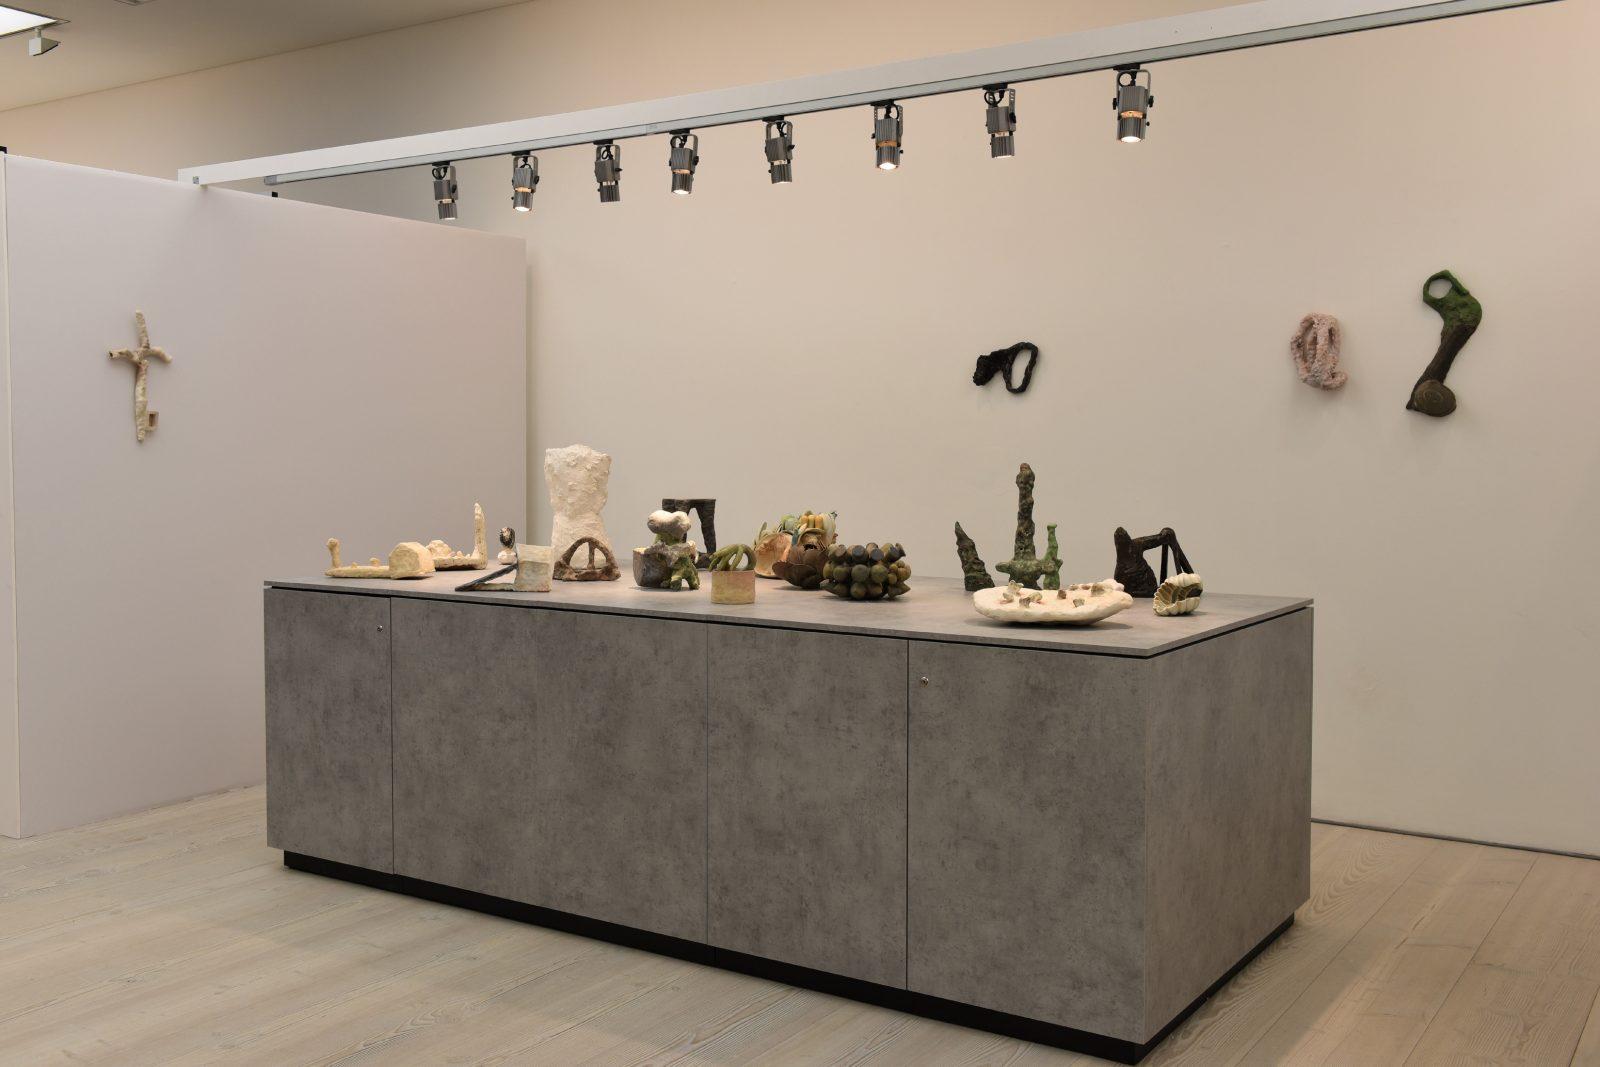 Collect 2018 –Beate Kuhn, Klaus Lehmann, Hans Fischer –Galerie Metzger, ceramics